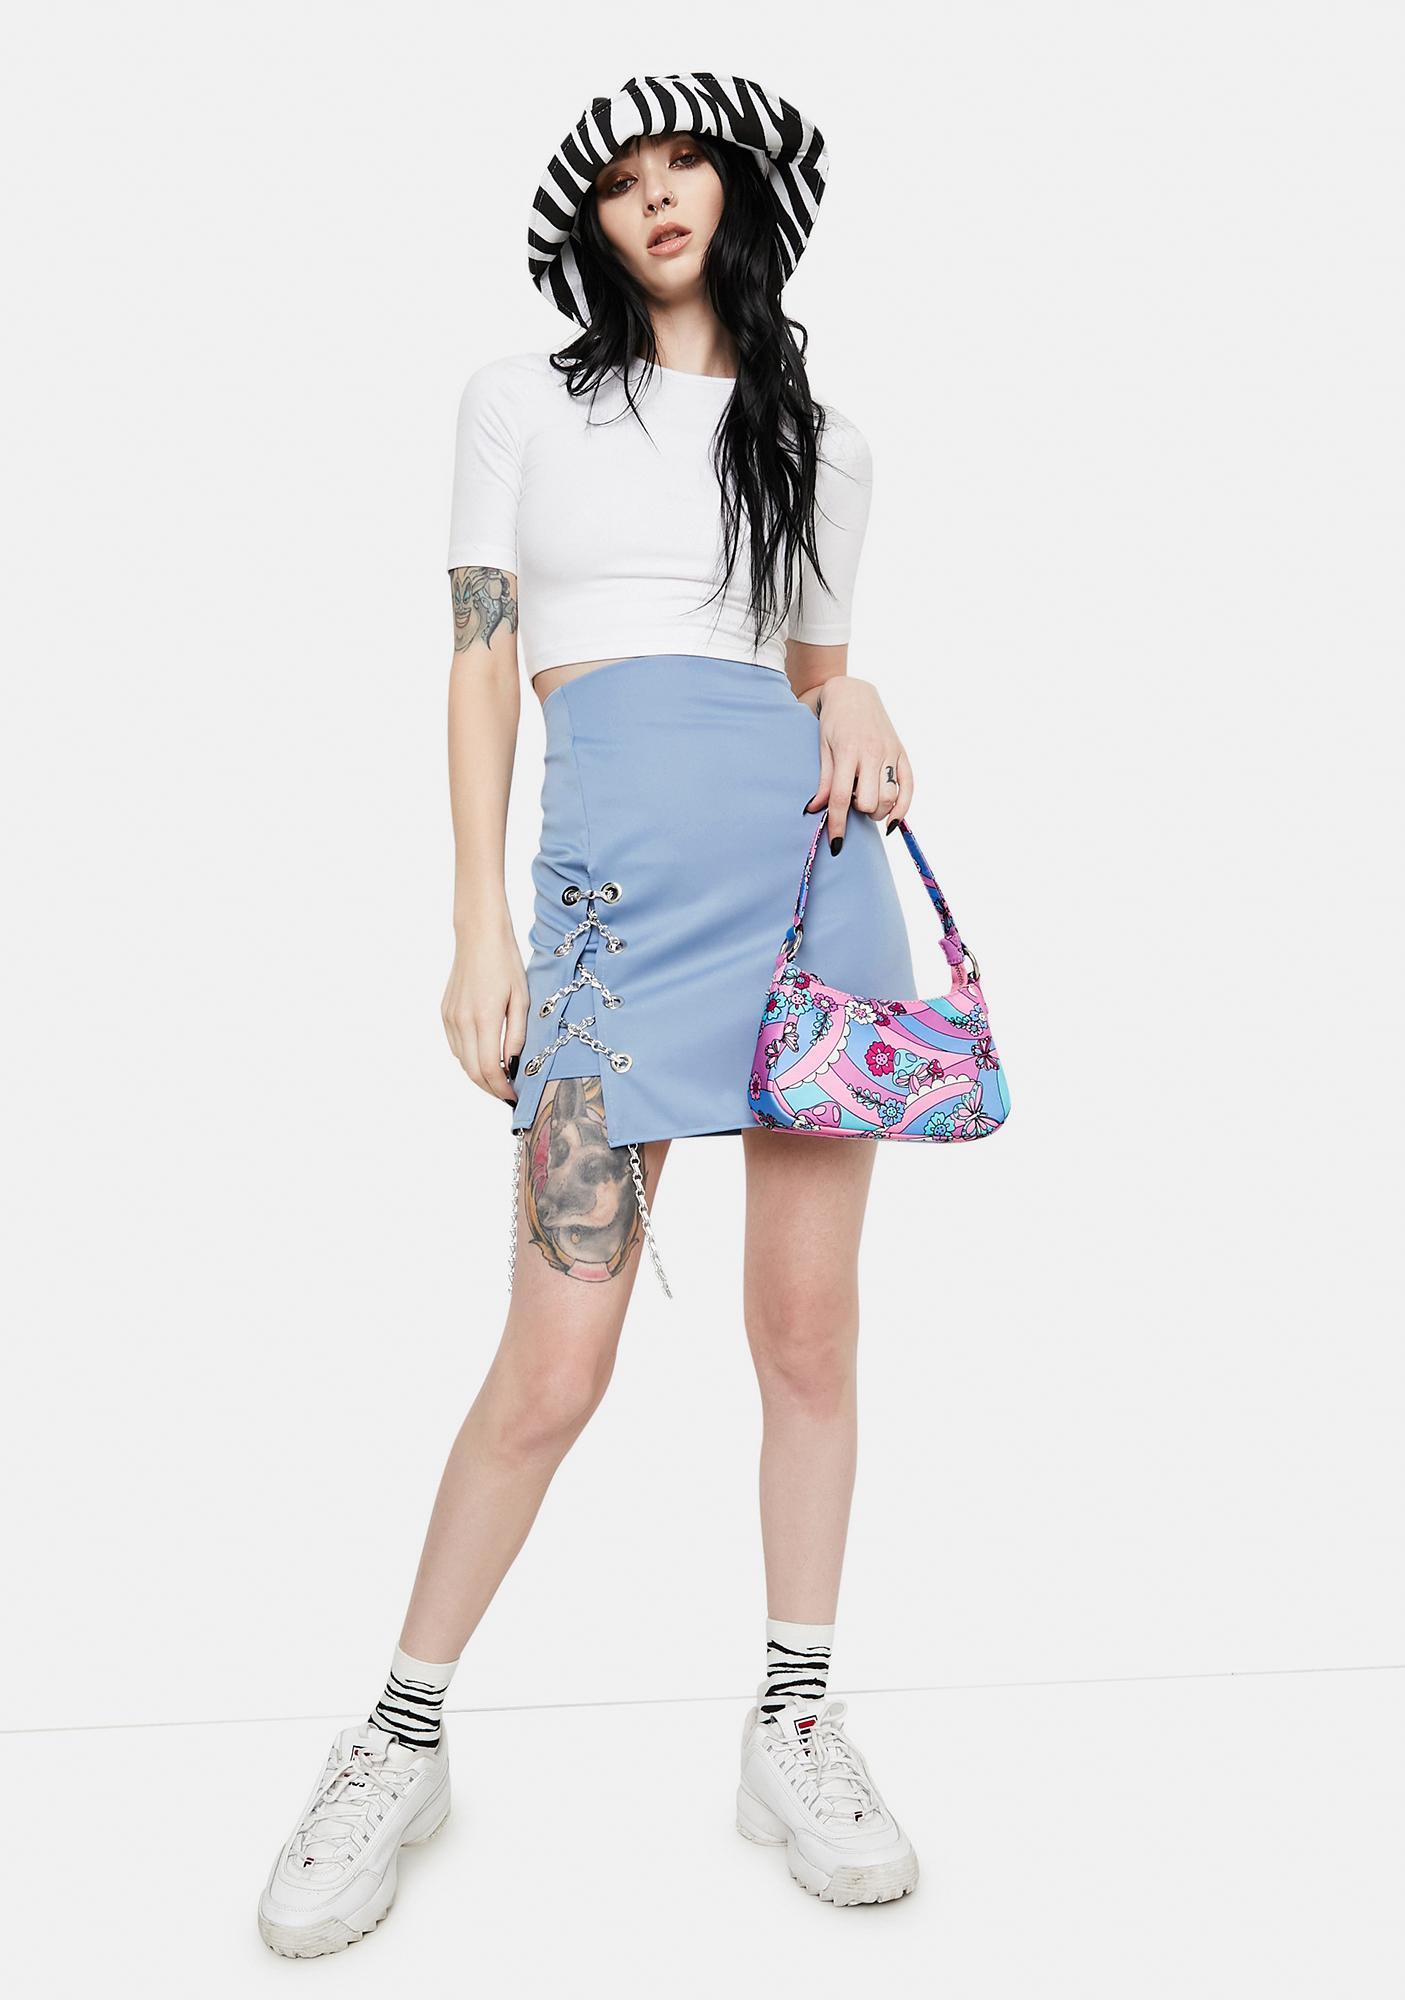 ZEMETA Chain Tie Lake Blue Skirt